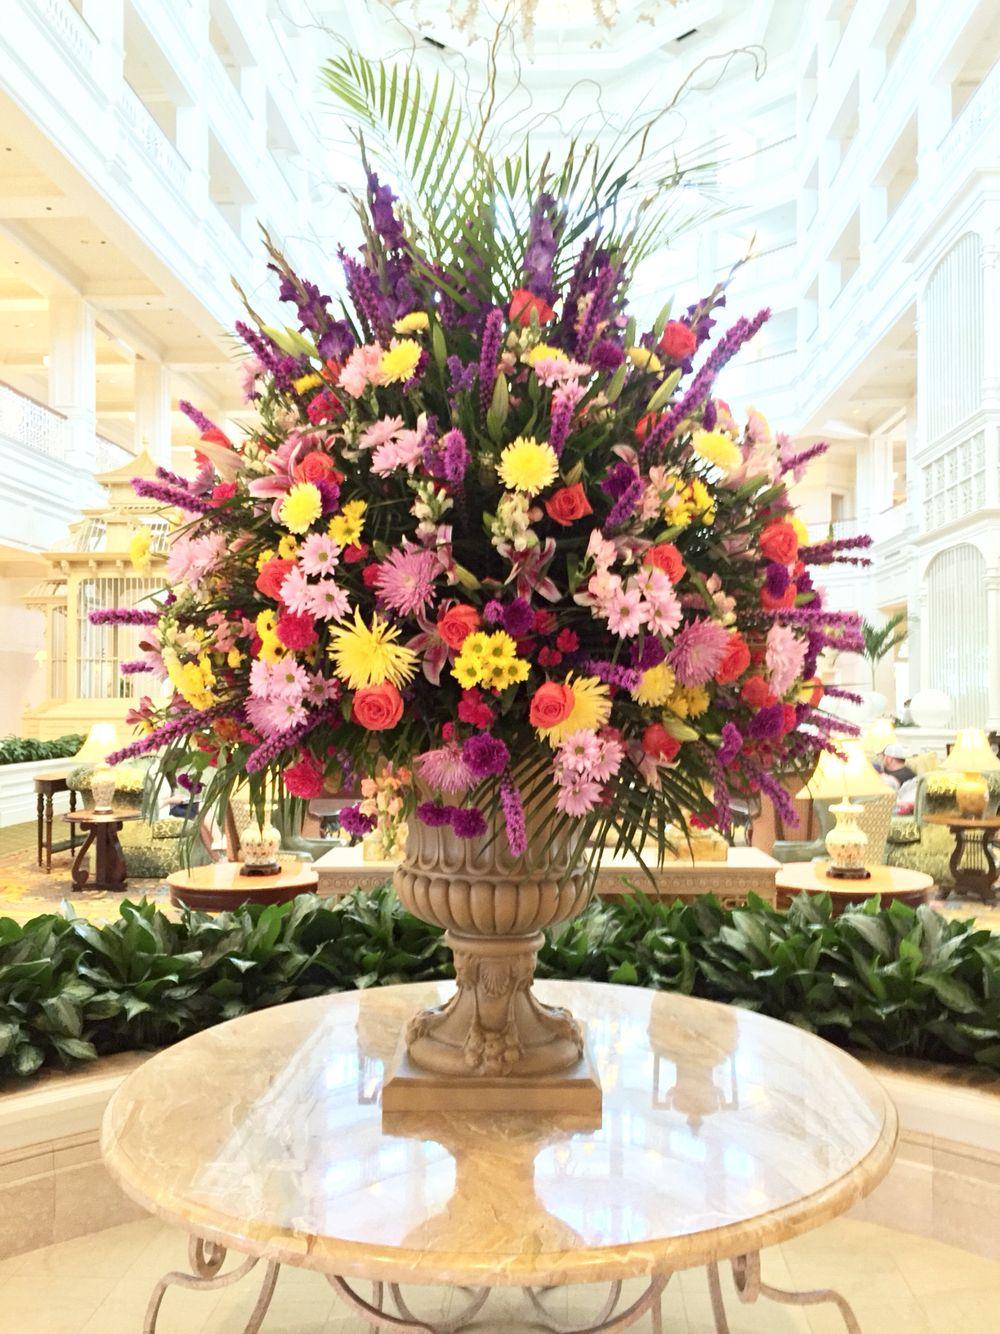 Florals at Grand Floridian